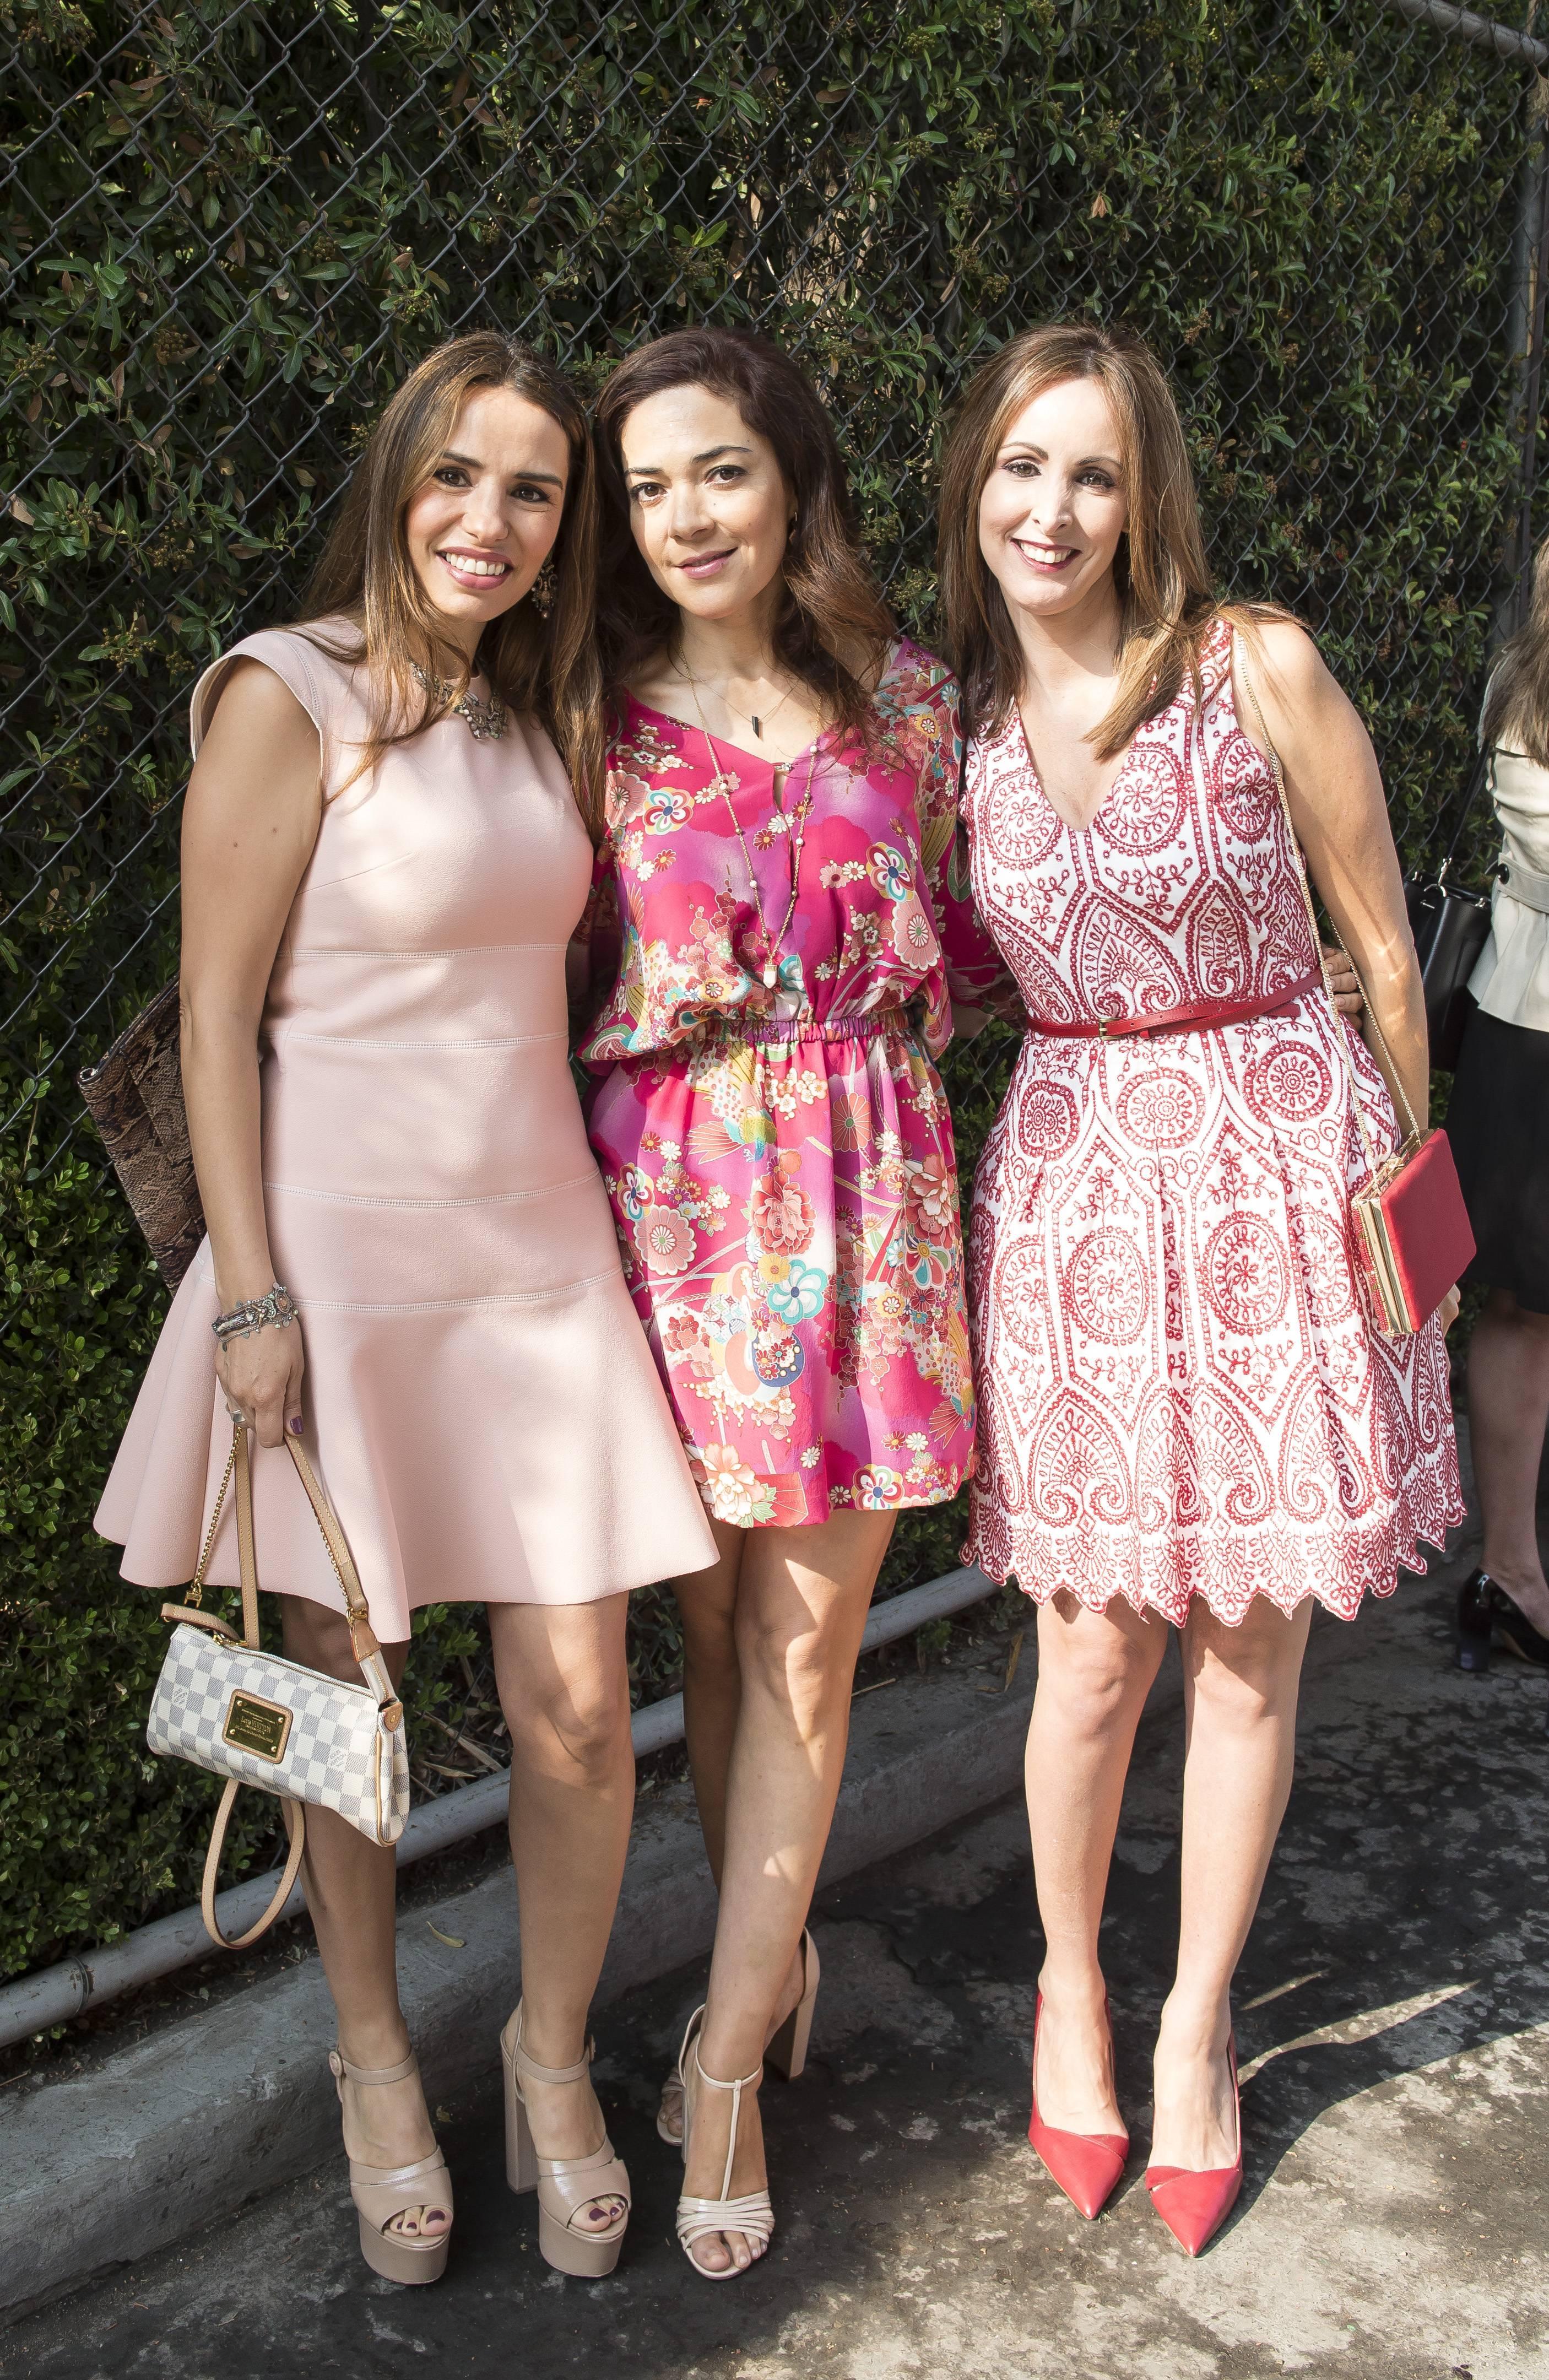 Mariana Castillo, Lissette Araiza y Alexandra Peláez disfrutaron del festejo. JDS